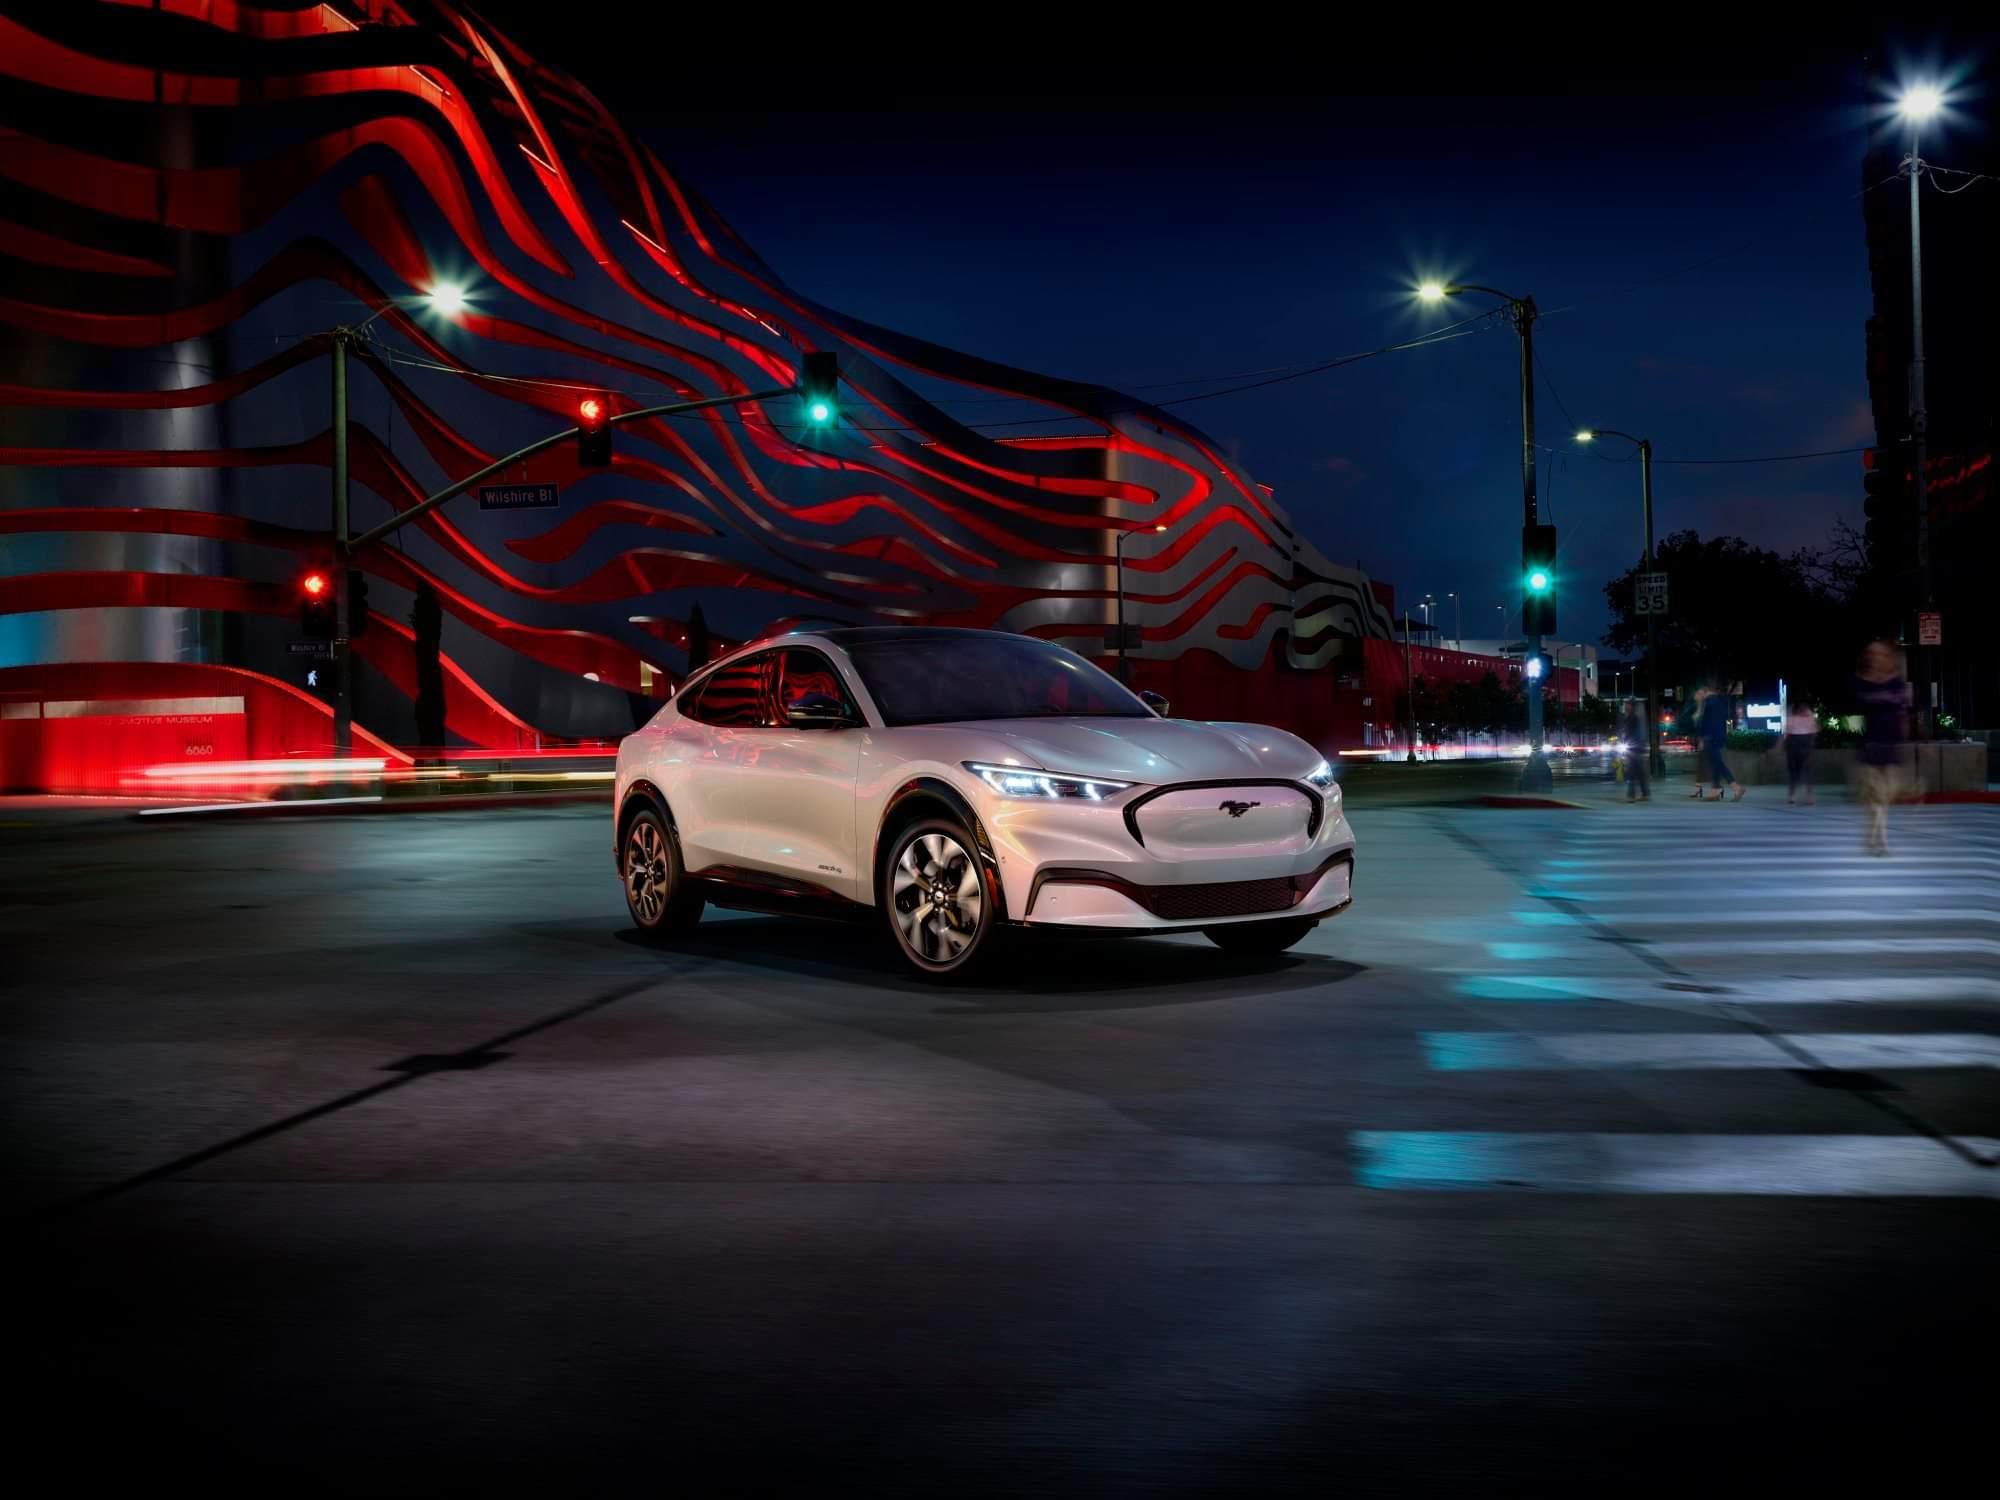 Le Vus Ford Mustang Mach-E 2021 | Léveillé Ford